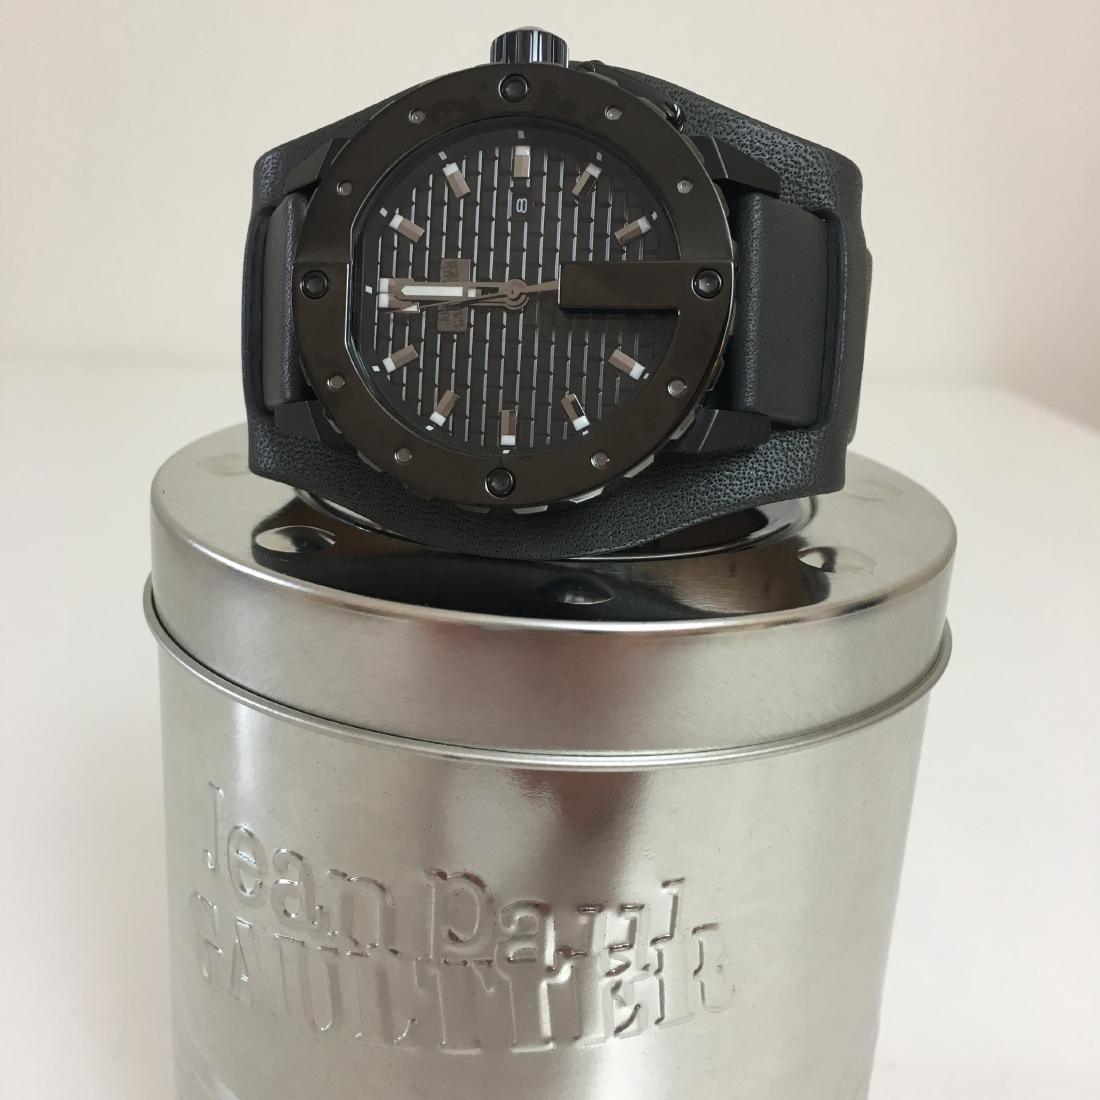 Jean Paul Gaultier – Men's Designer Wrist Watch - 2